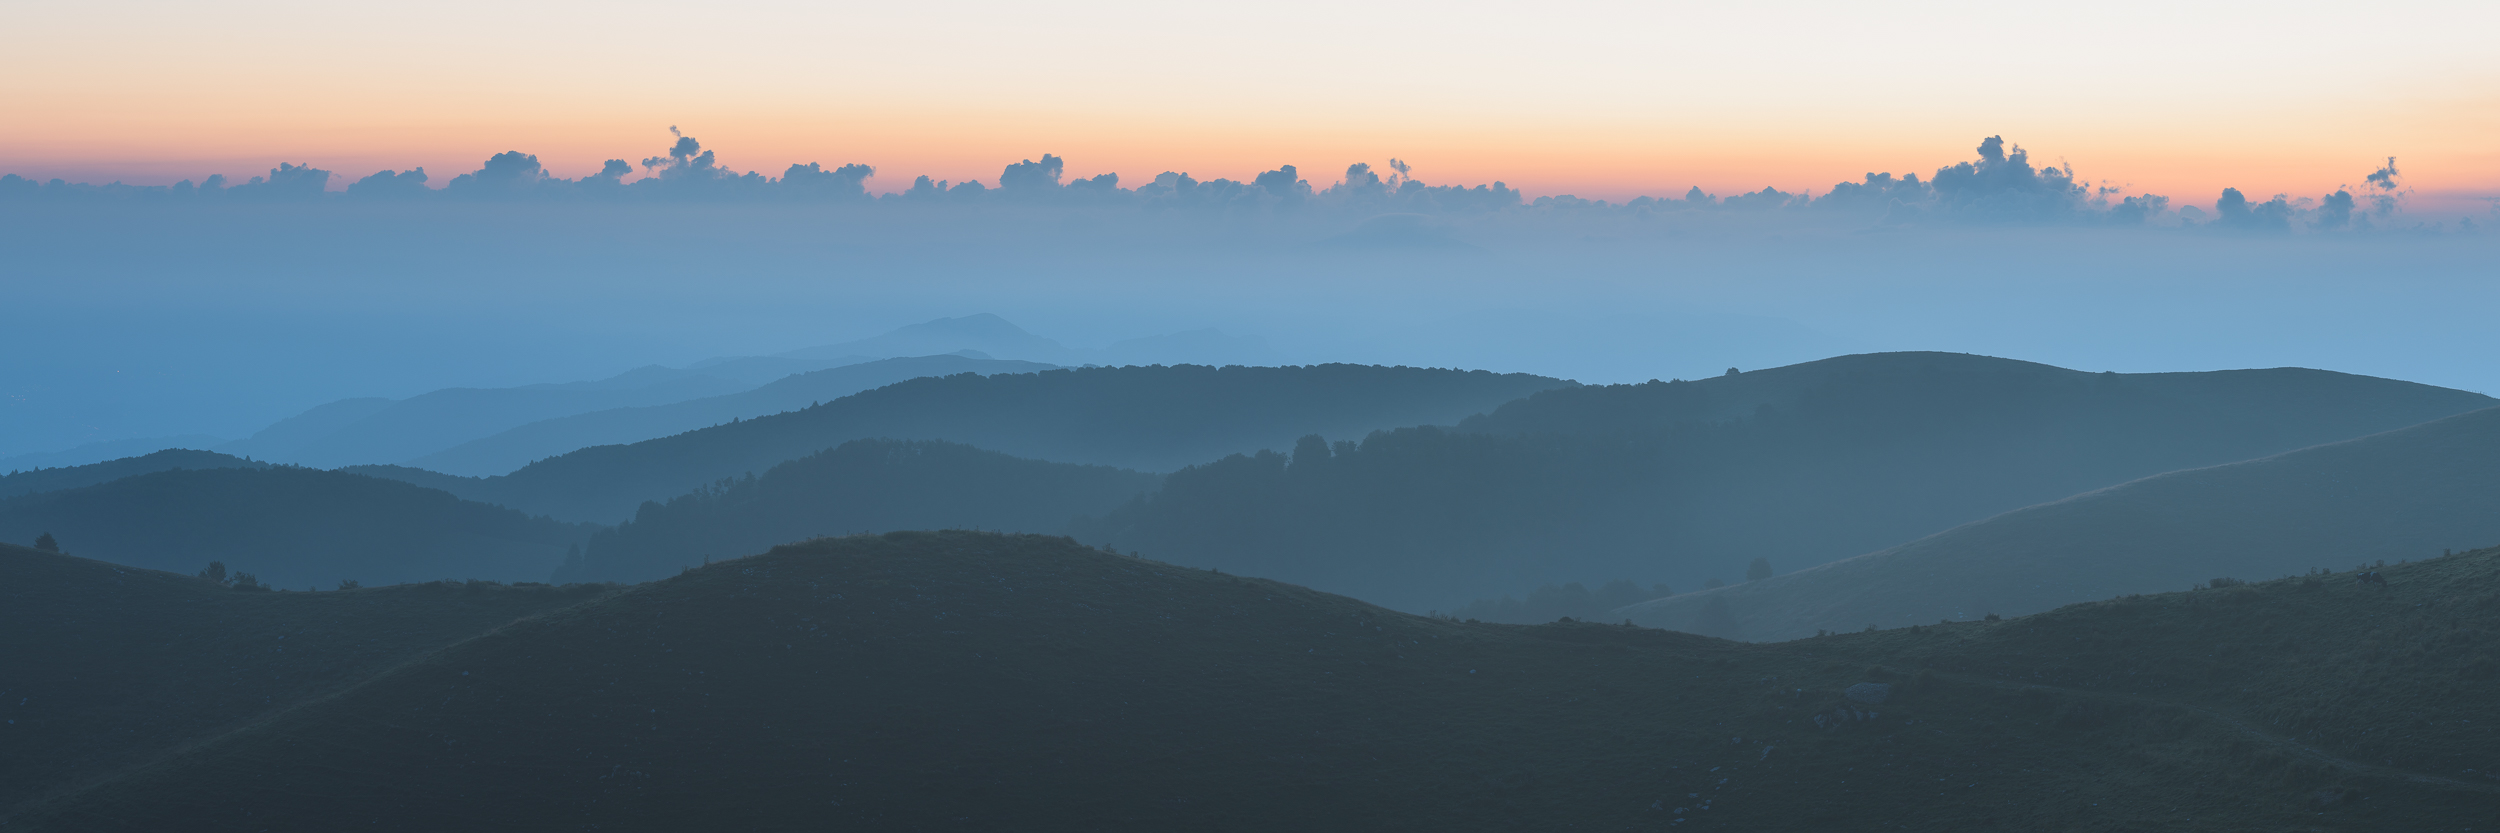 2018-08-11_Web__Sunrise.jpg